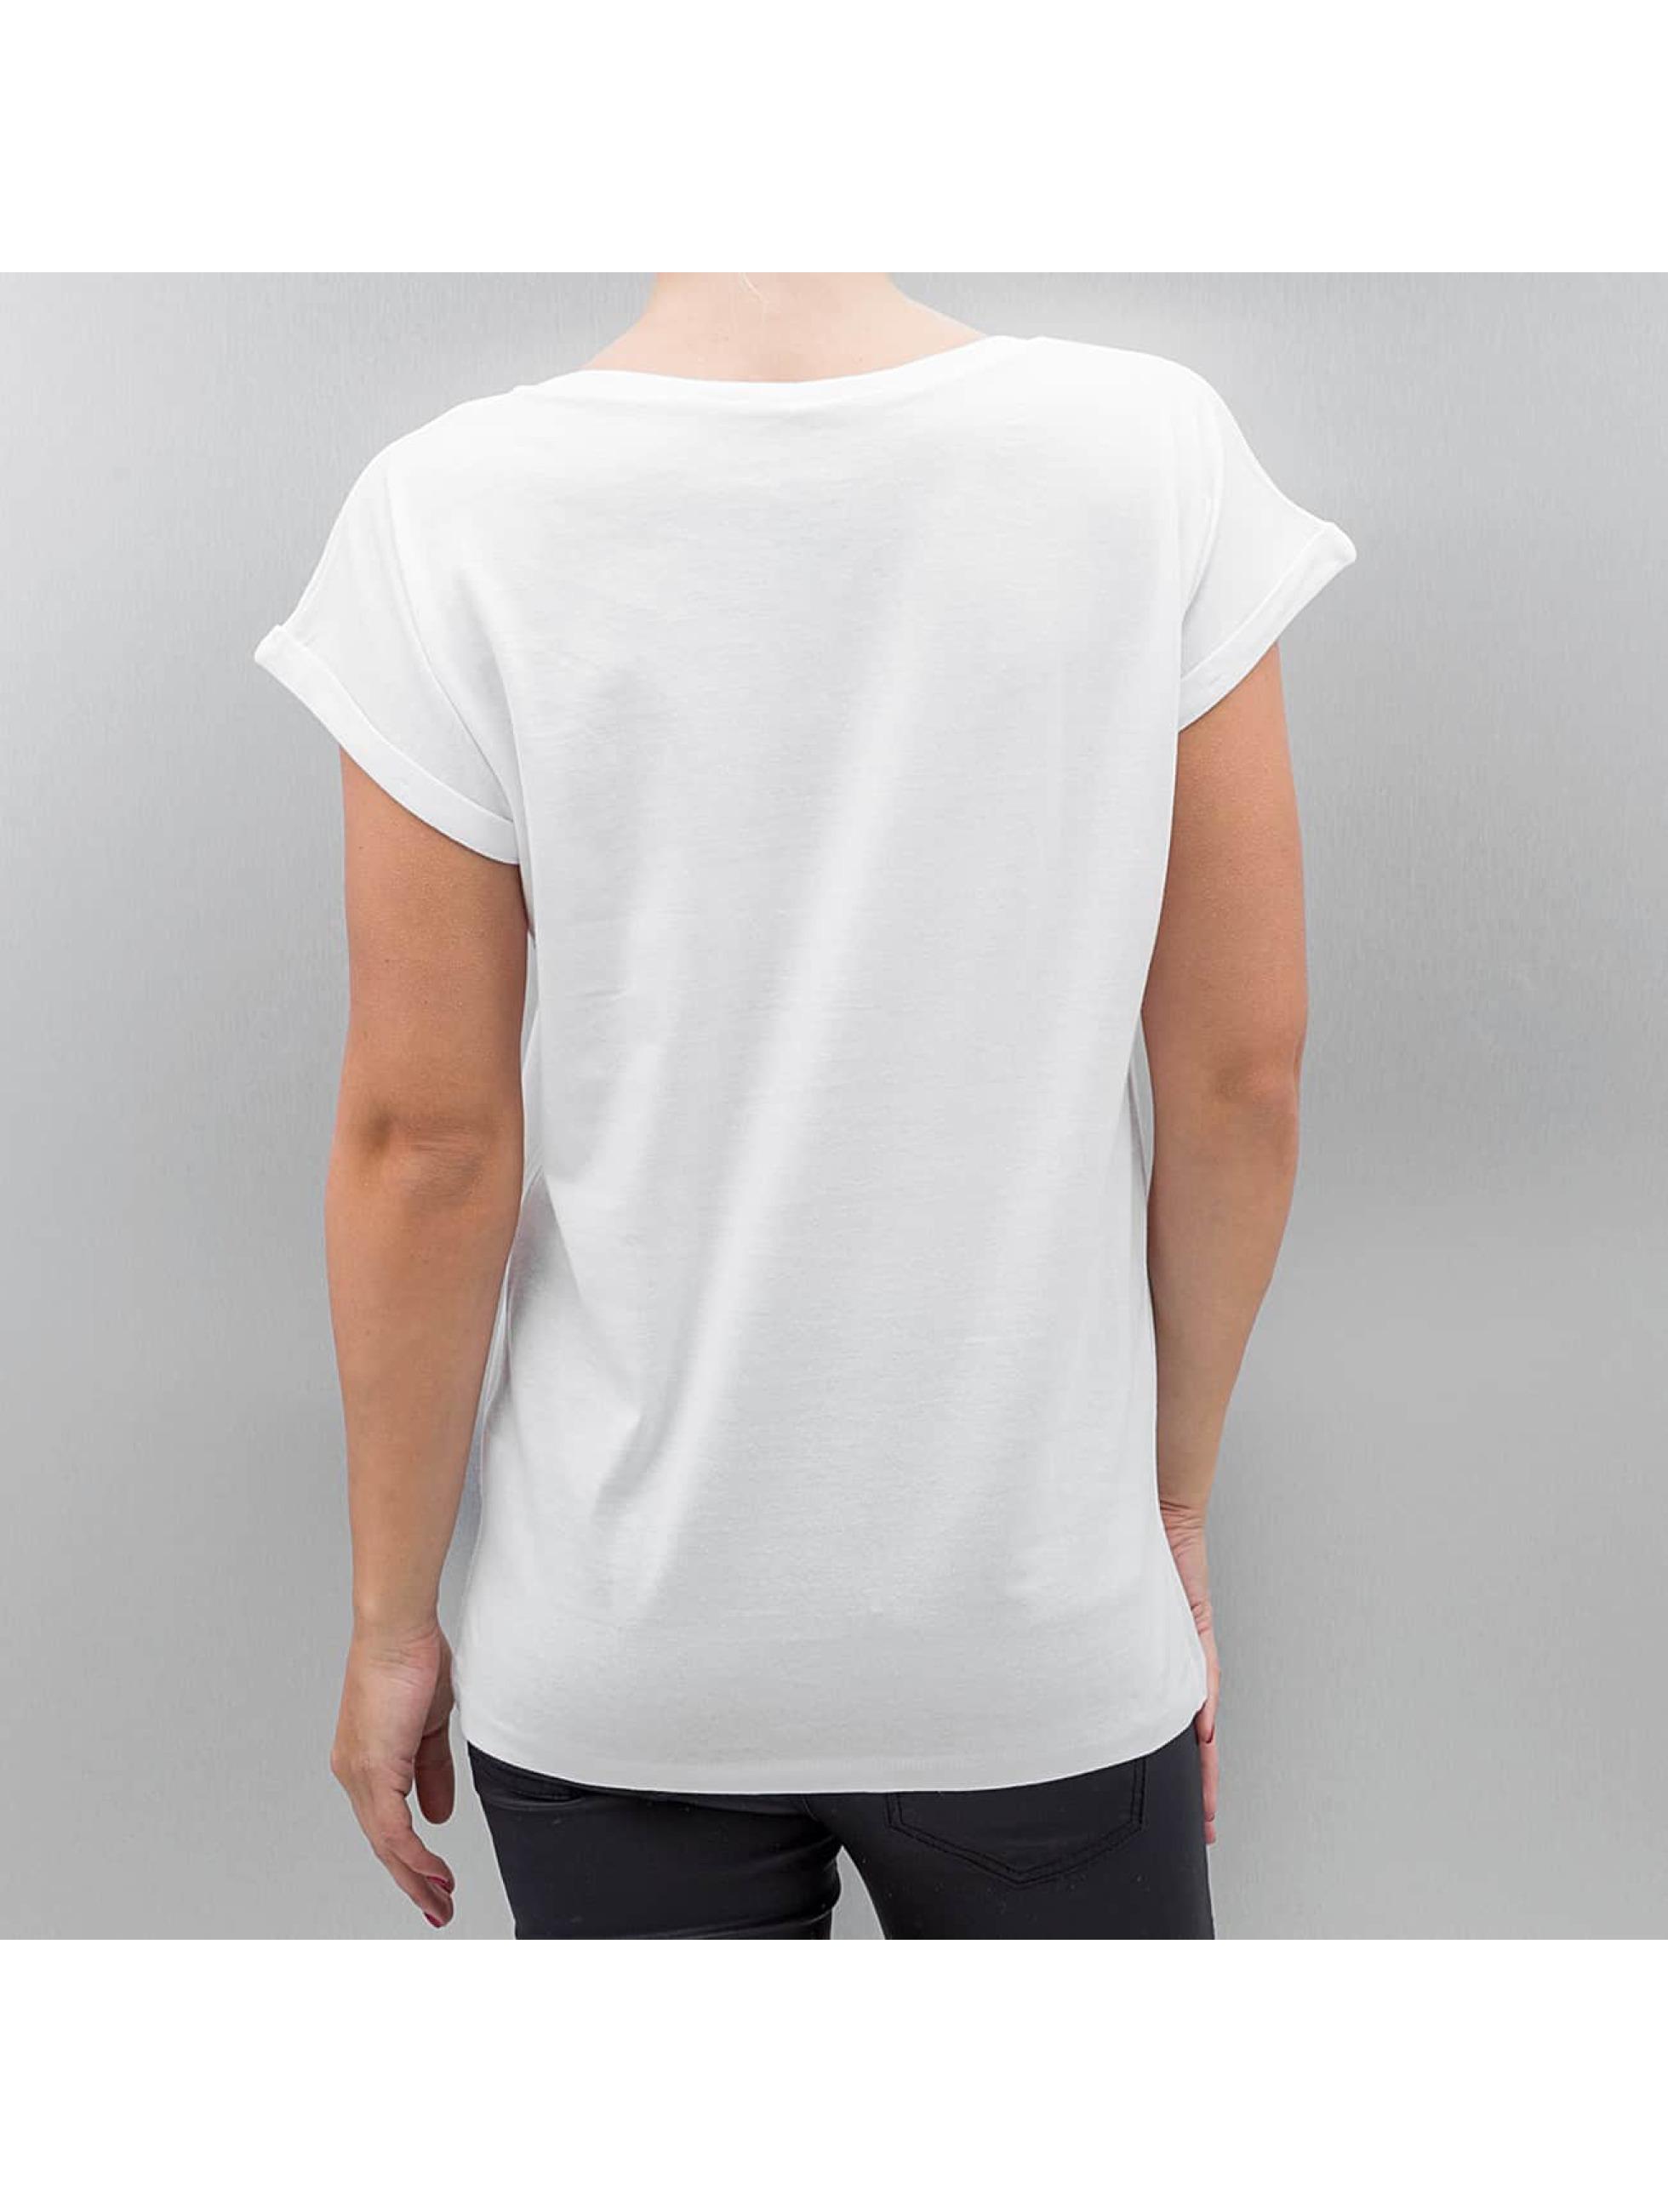 Mister Tee T-Shirt Ladies John Lennon Bluered weiß